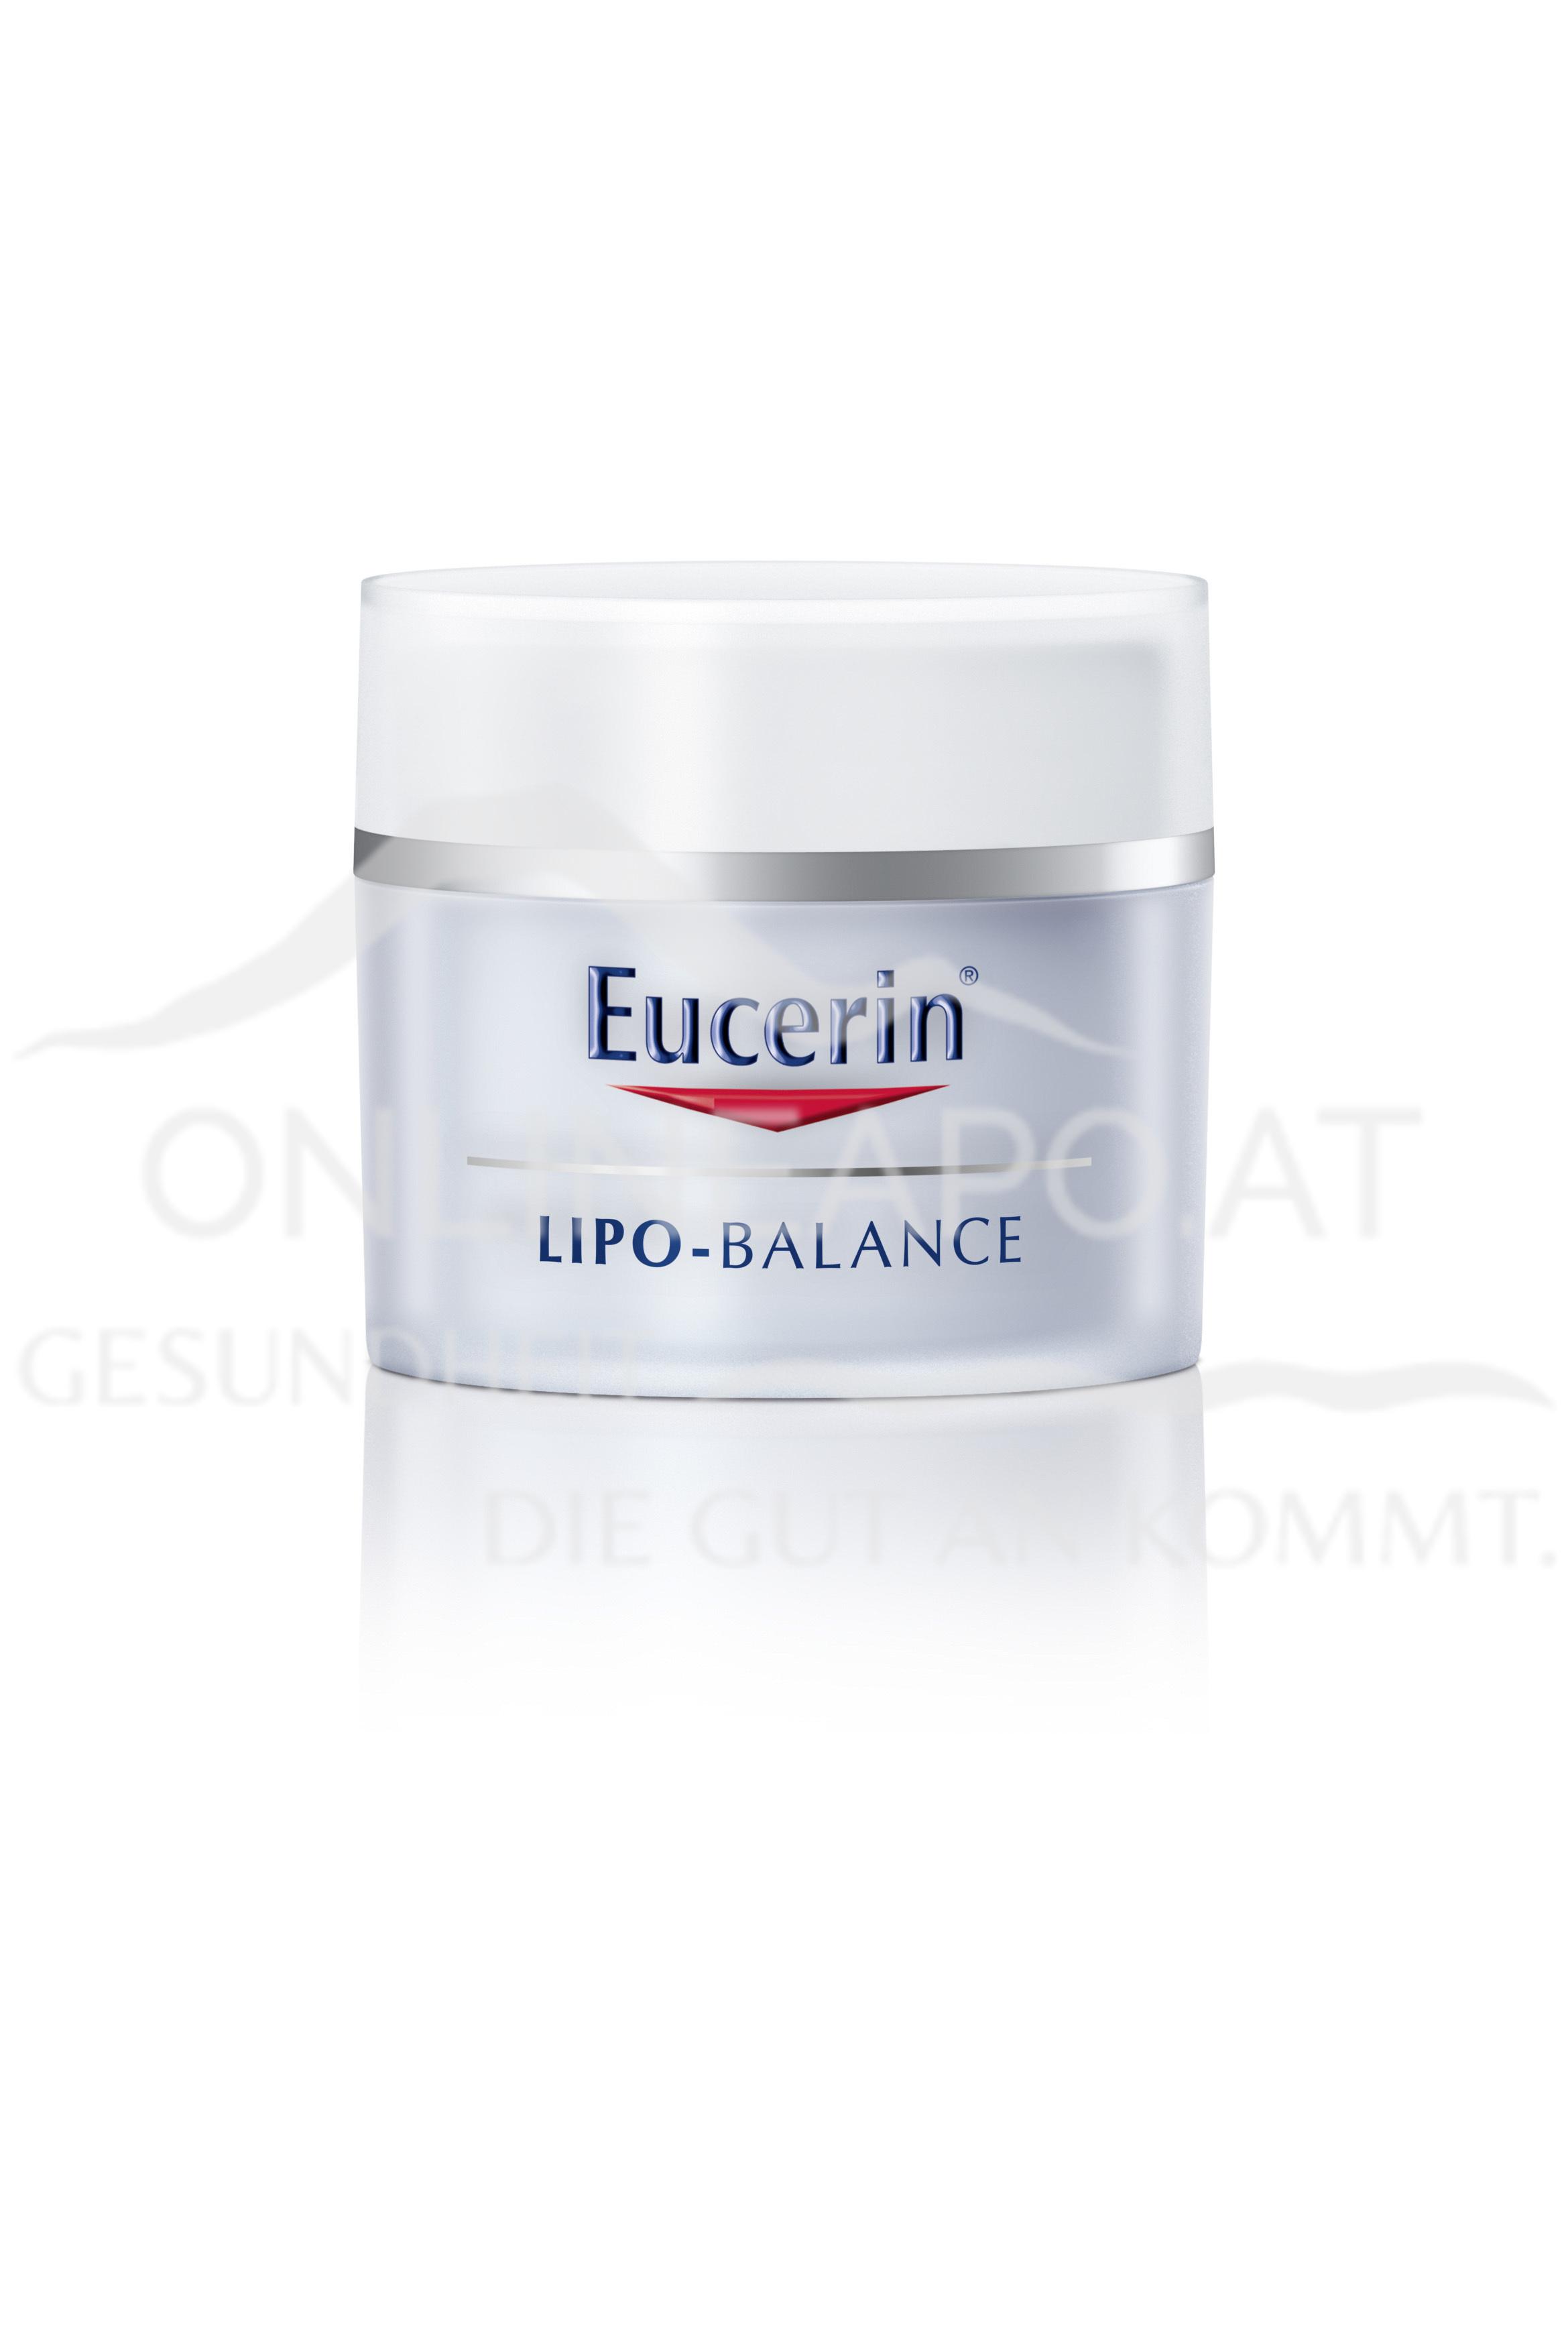 Eucerin LIPO-BALANCE